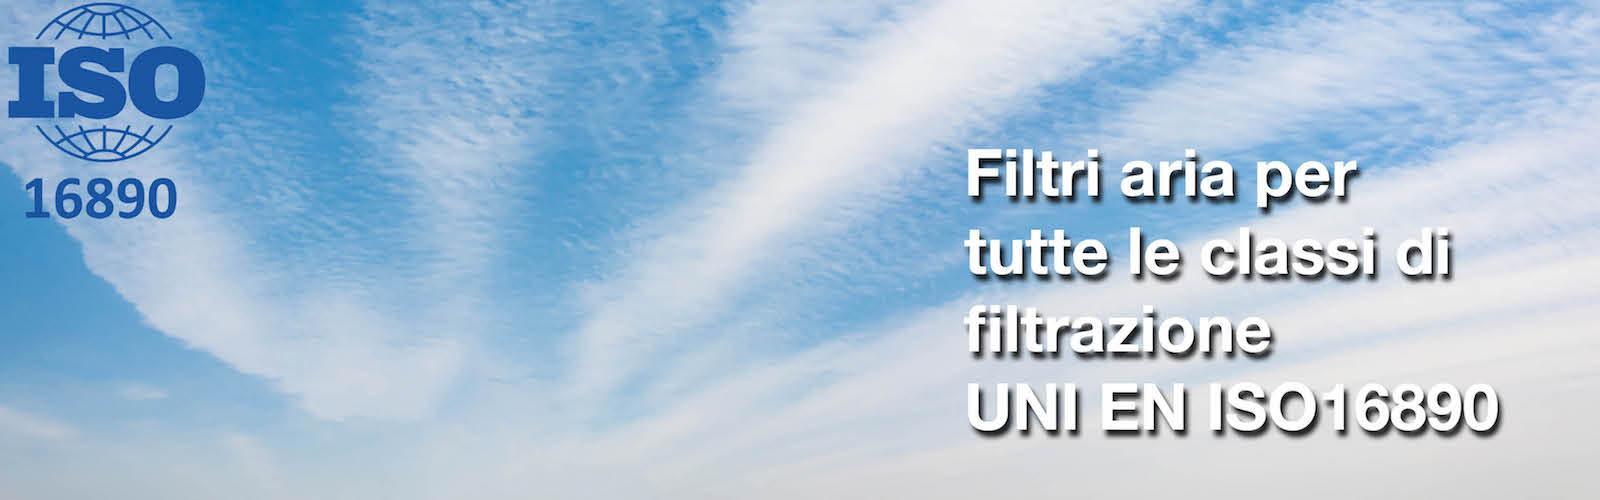 filtri aria UNI EN ISO 16890